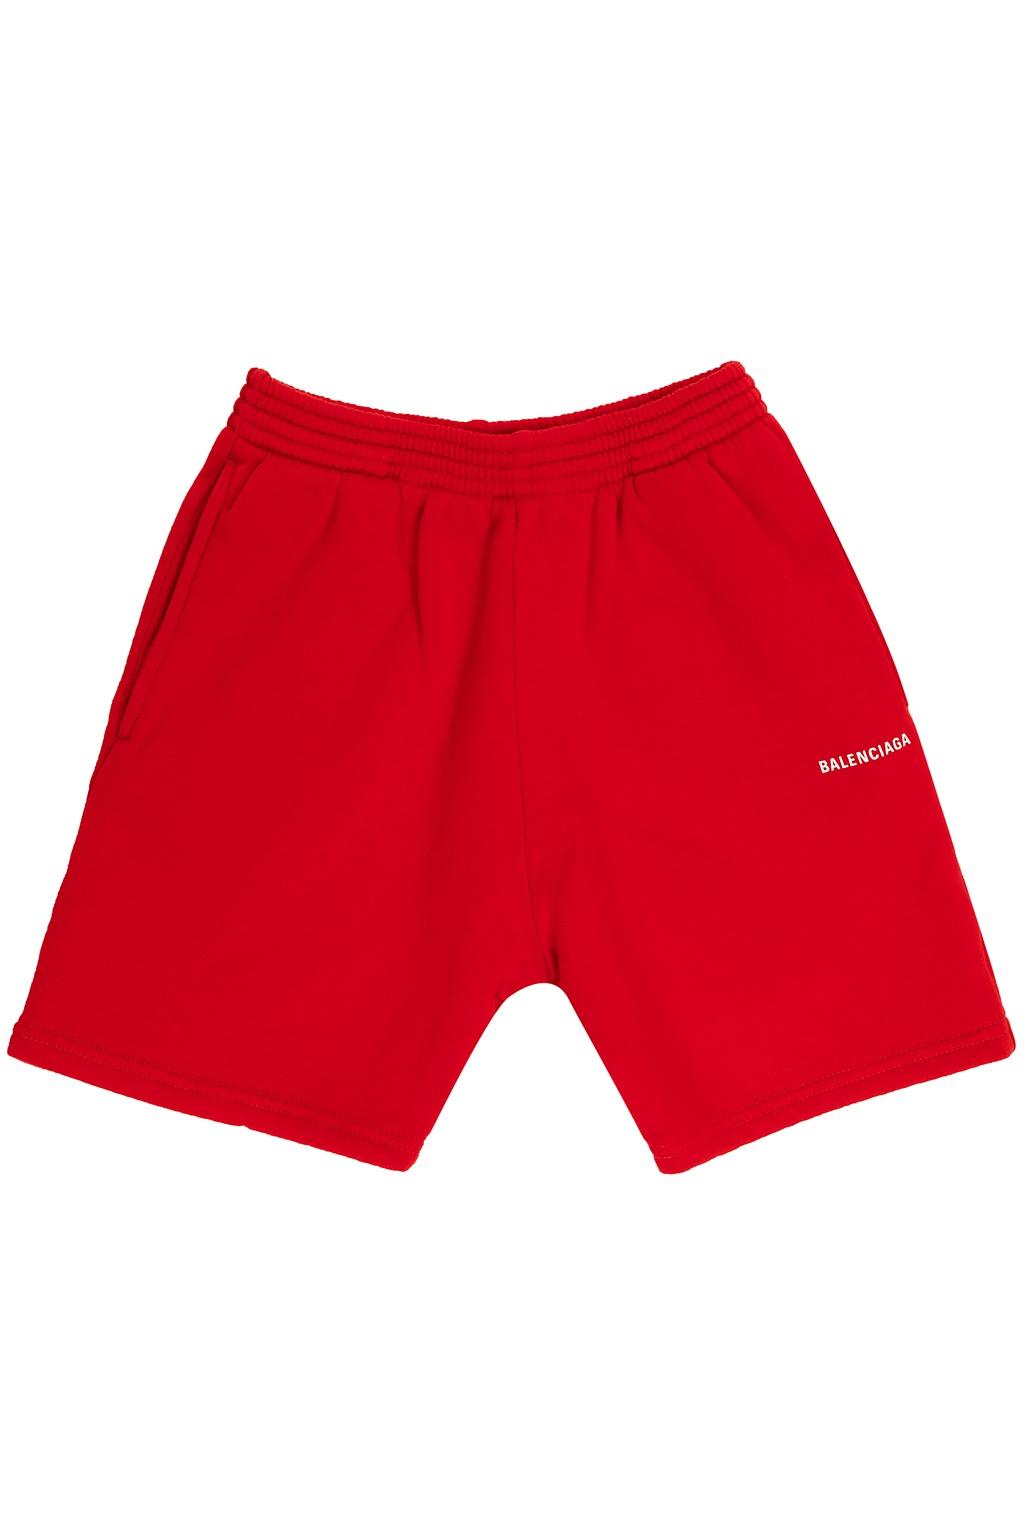 Balenciaga Kids 品牌运动短裤